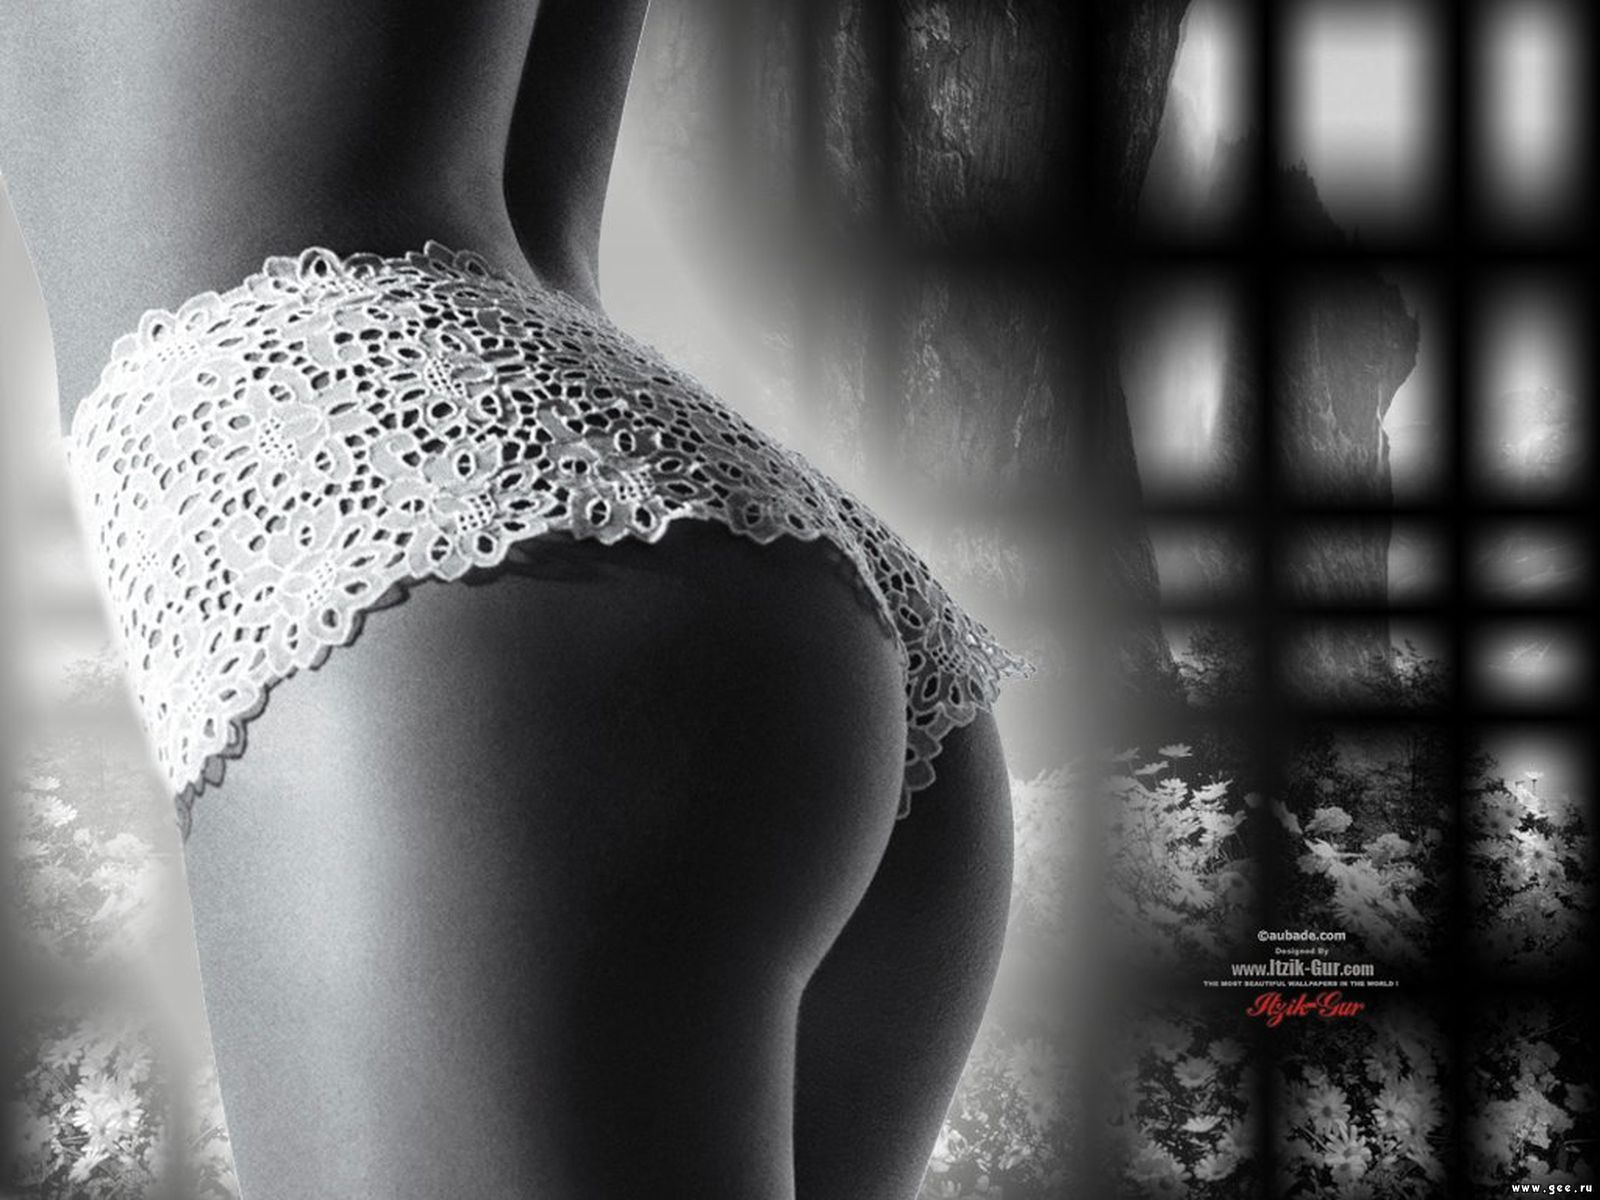 Мир загрузок - Image 63.jpg - Эротика - ХХХ Фото - Super Popochki